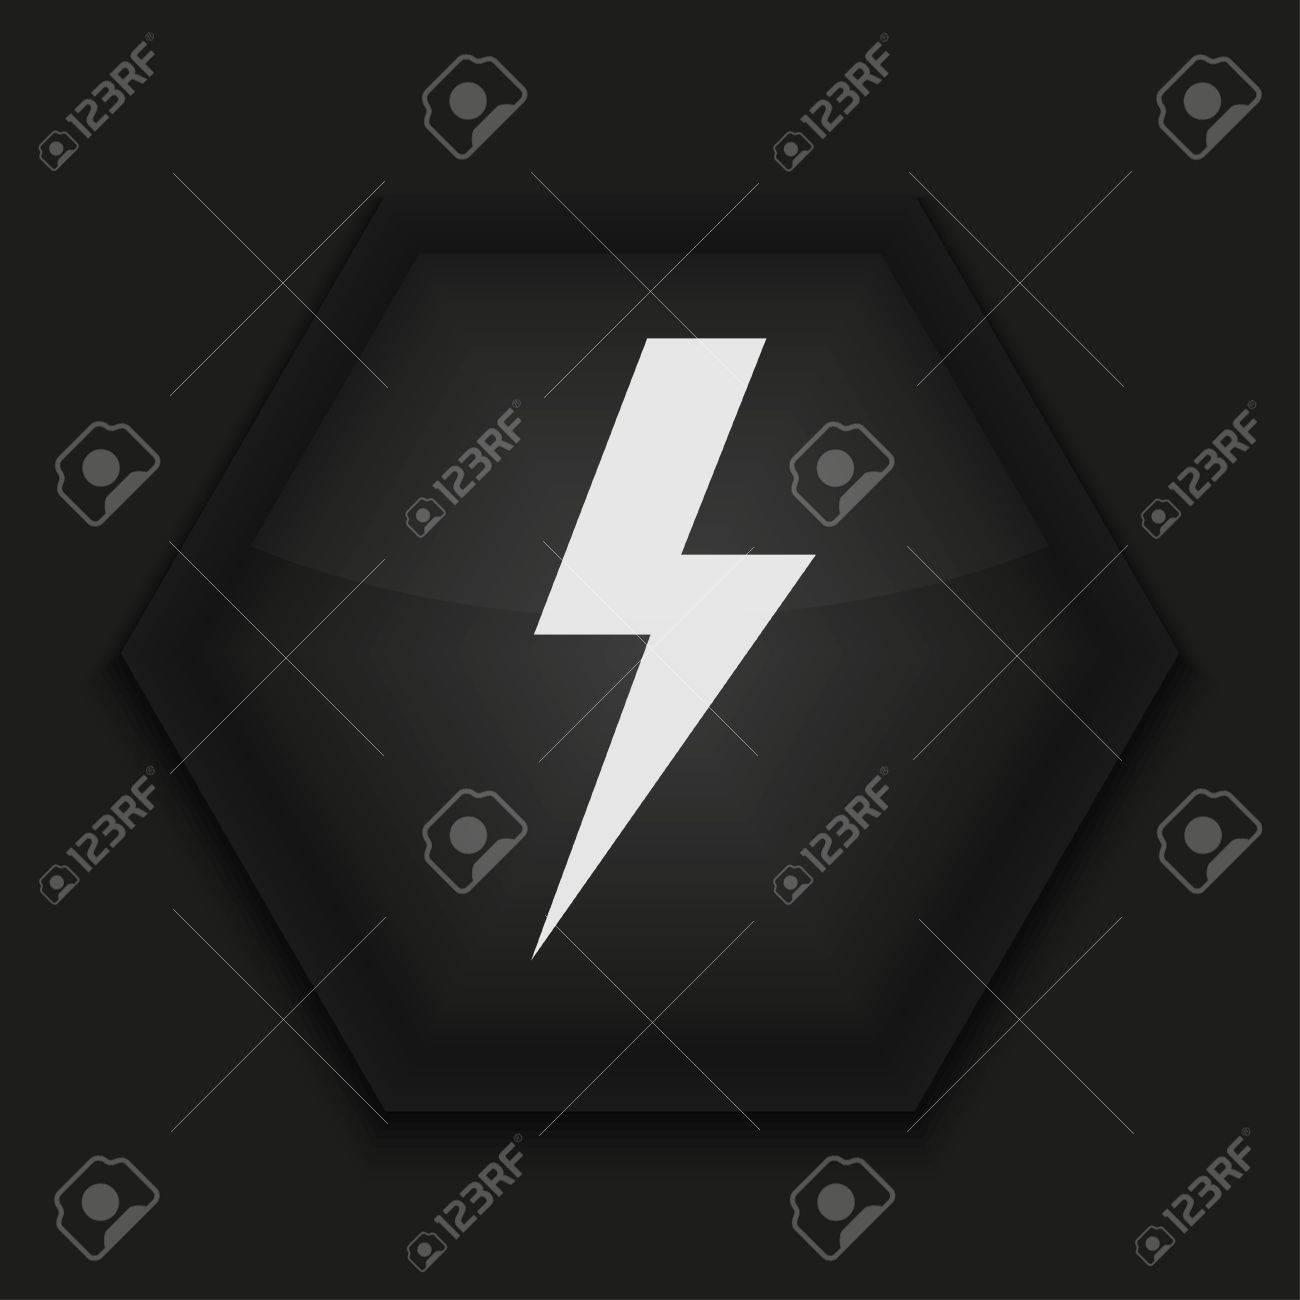 Vector creative icon on black background. Eps10 Stock Vector - 17273848